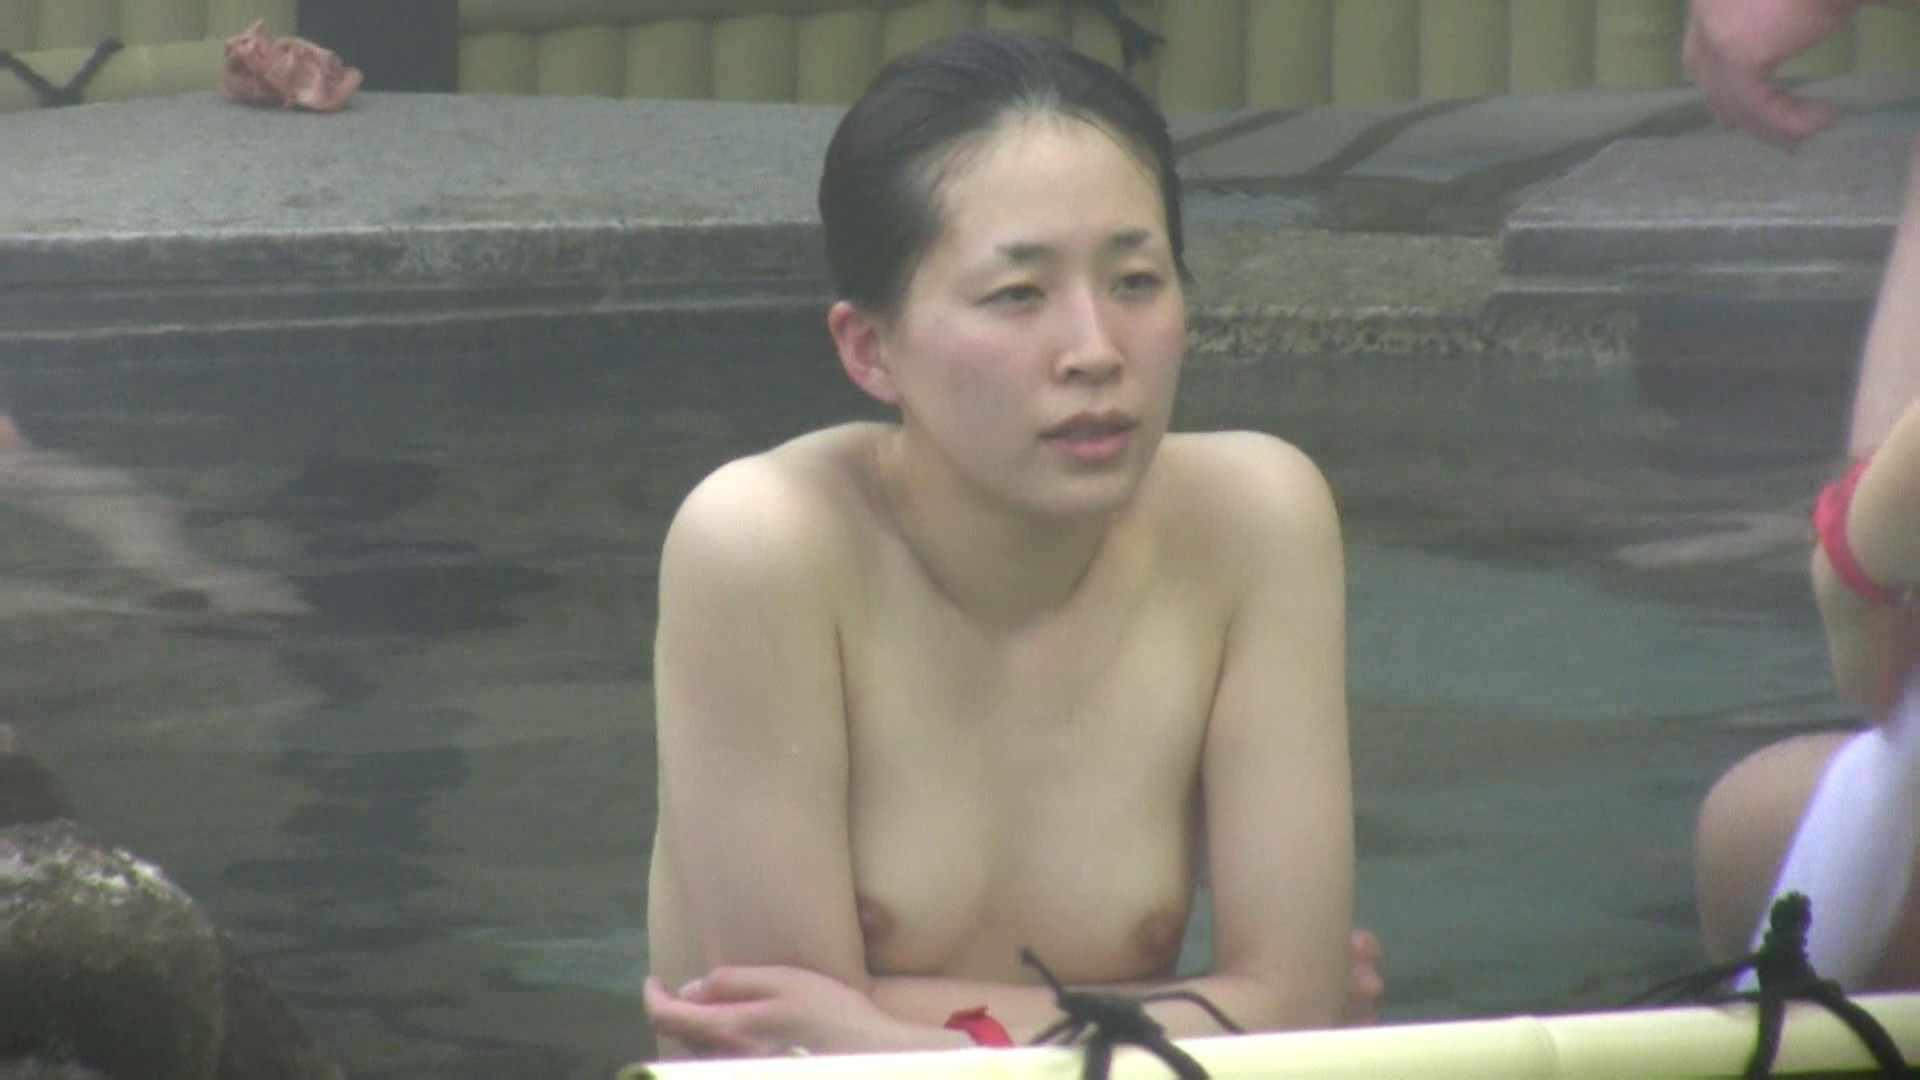 Aquaな露天風呂Vol.583 美しいOLの裸体 すけべAV動画紹介 103pic 35